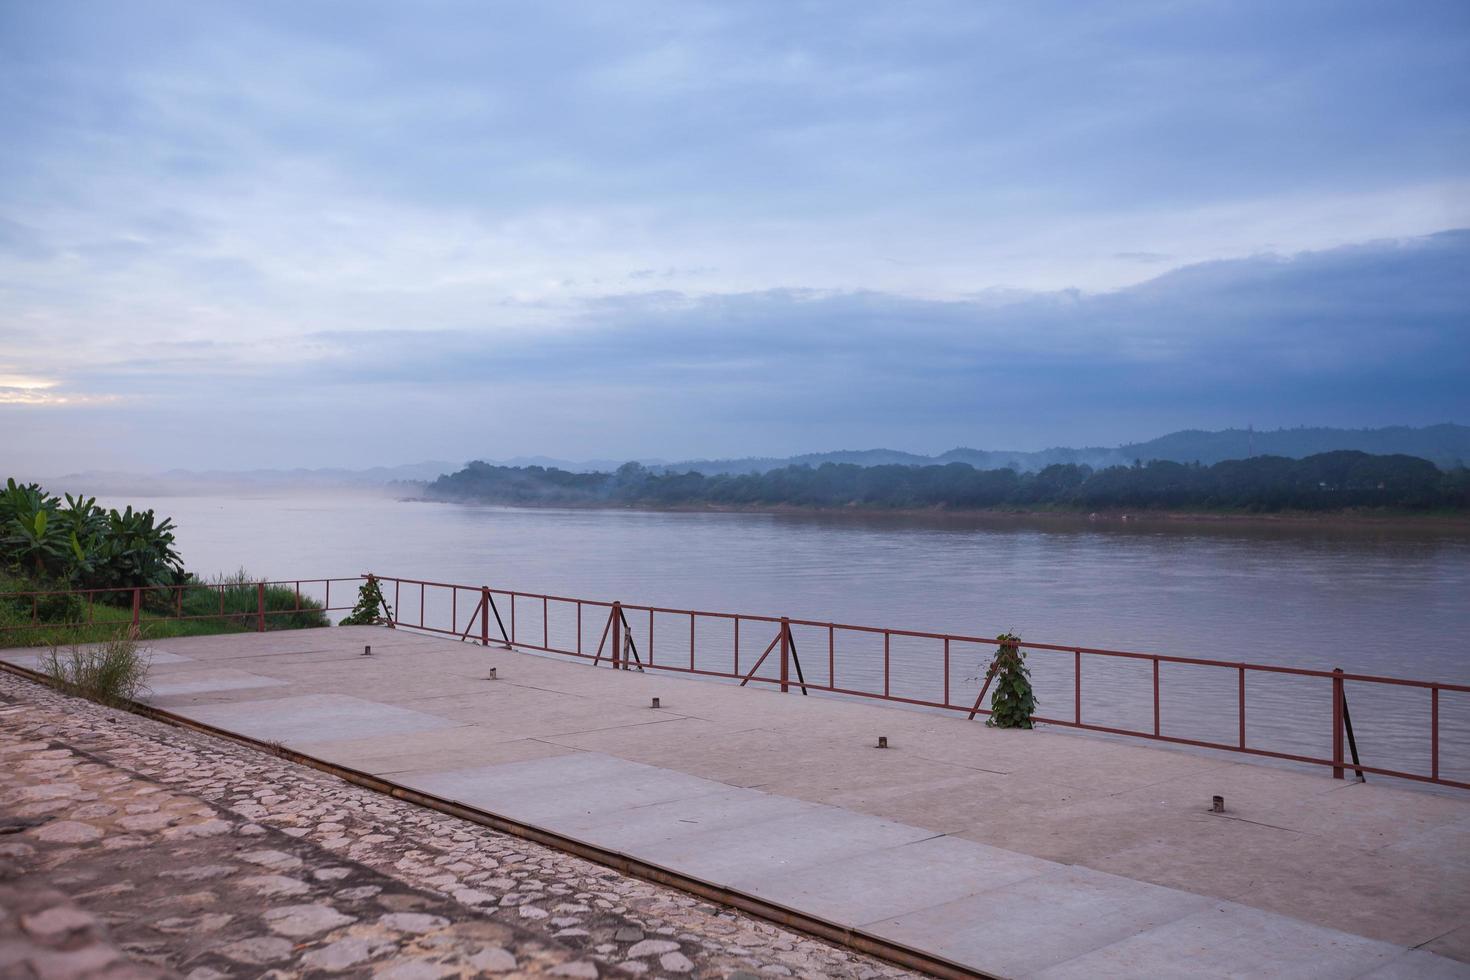 río mekong al atardecer foto